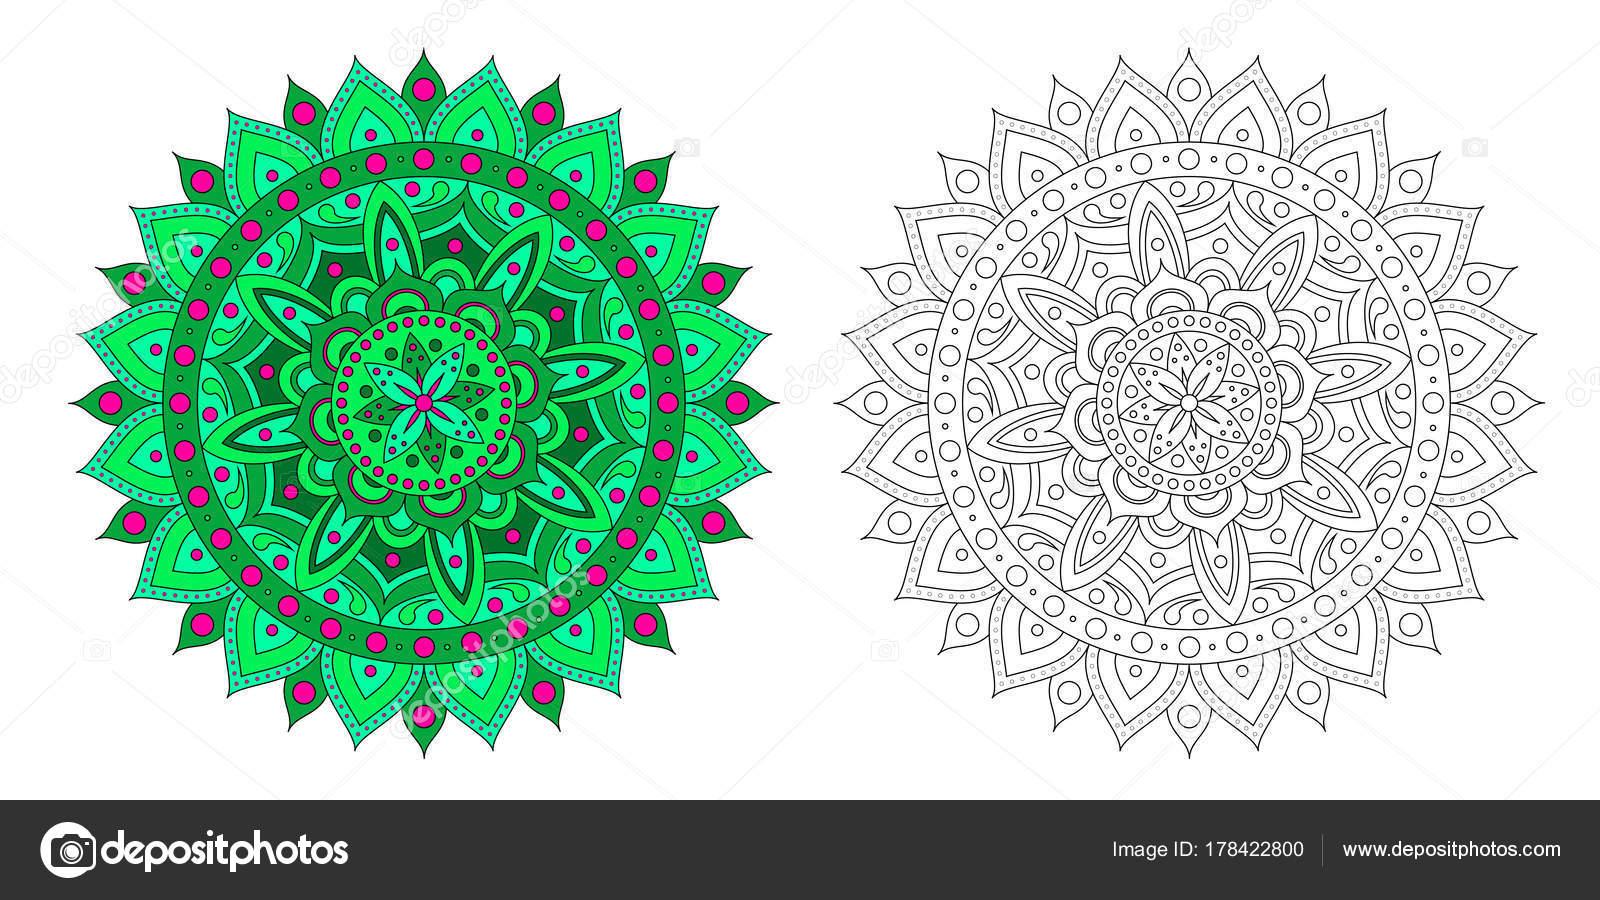 Coloriage Anti Stress Indien.Mandala Vert Rose Motif Contour Mandala Coloriage Stress